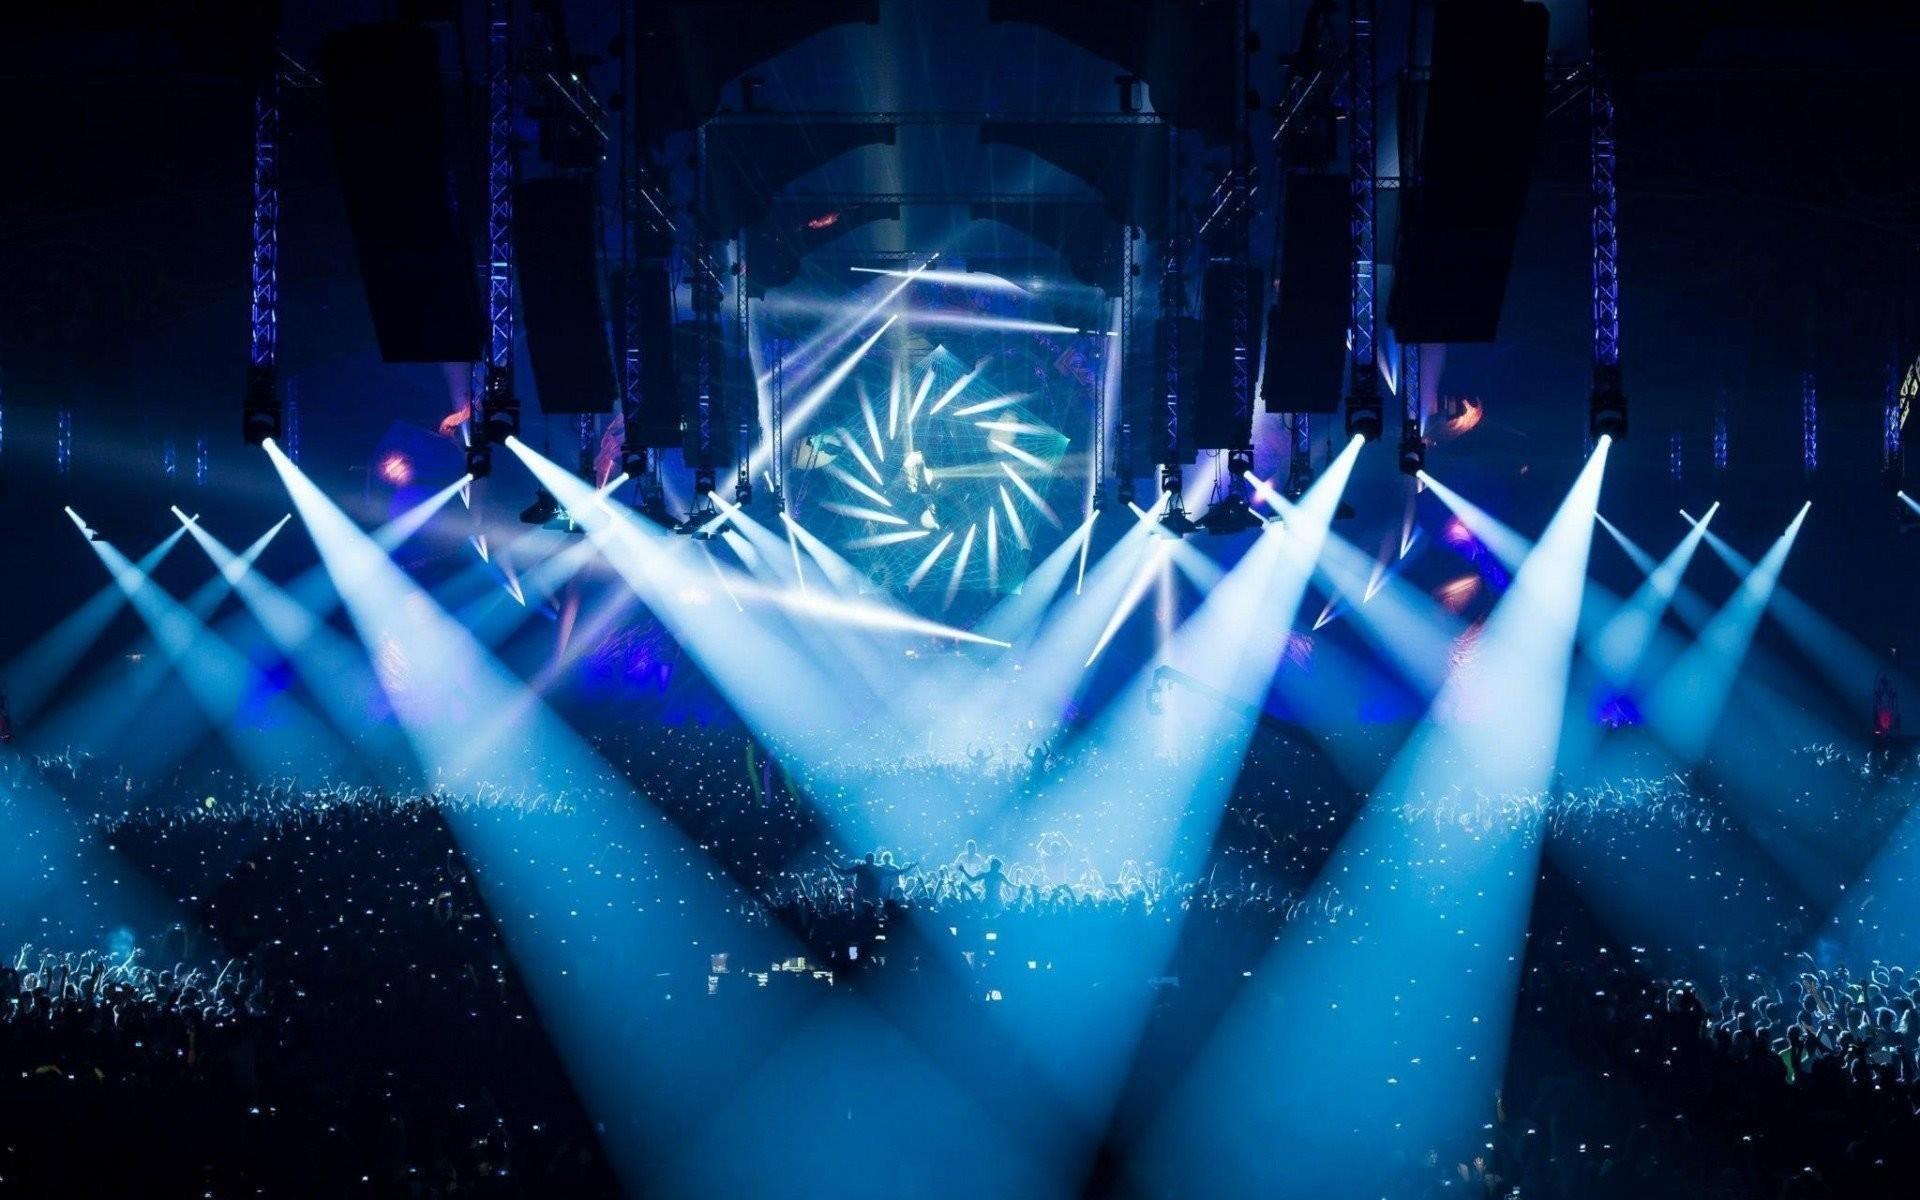 2560x1600 DJ Night Club Dj Console Concert Musician DJs